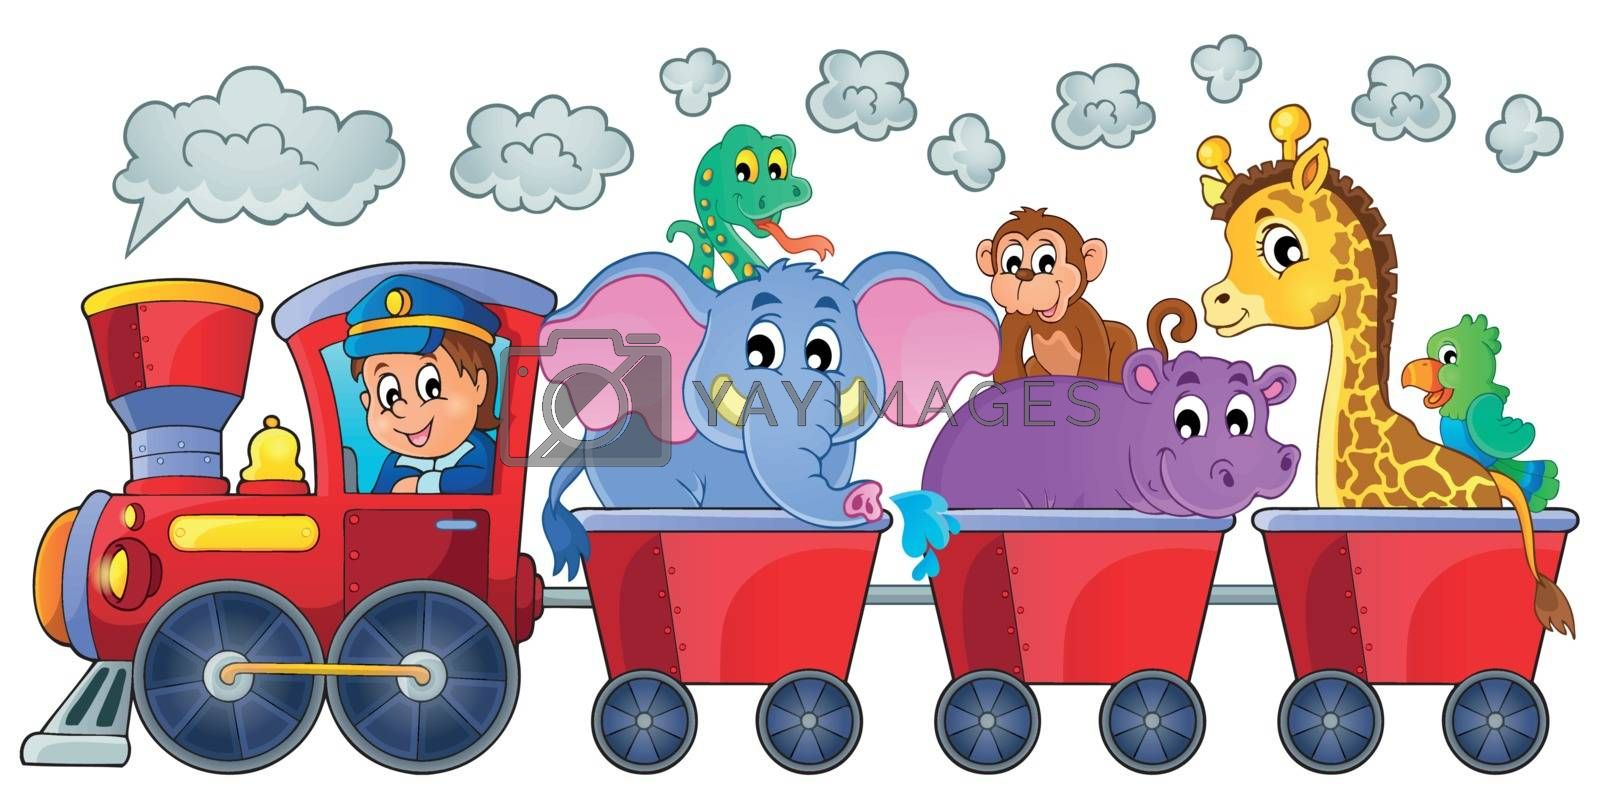 Train with happy animals - eps10 vector illustration.